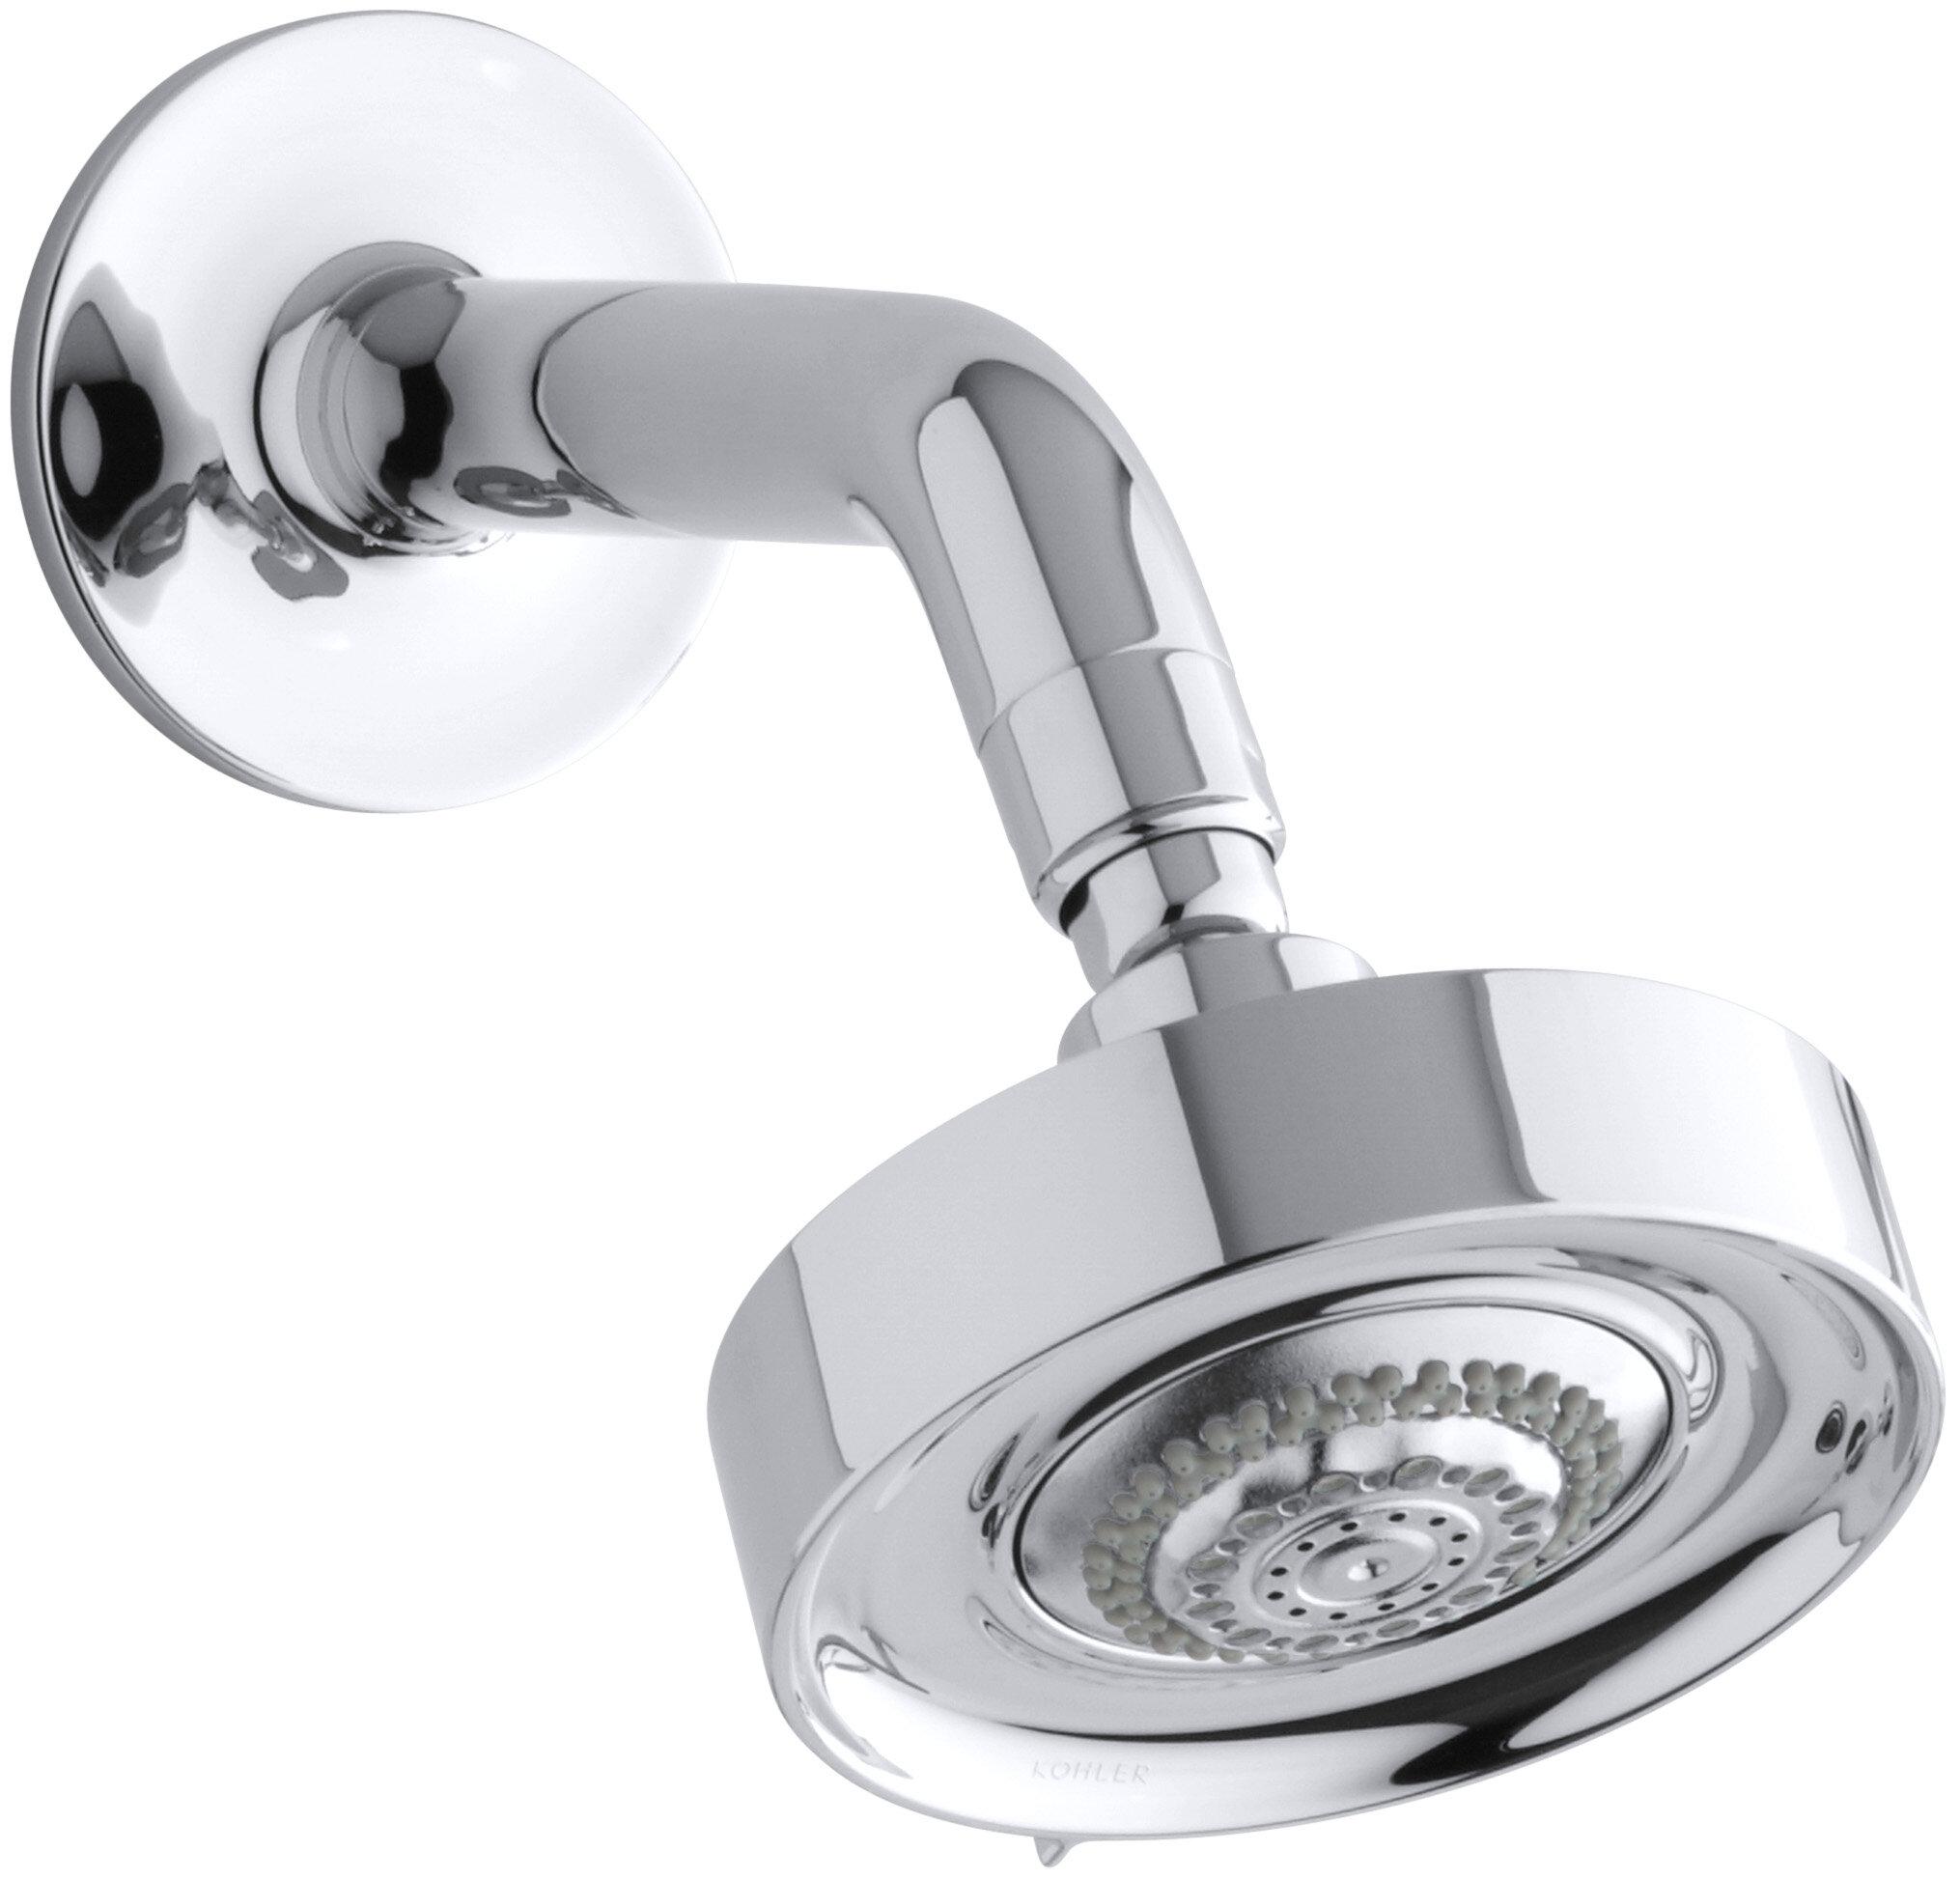 widespread speakman faucet head shower tiber sb bn